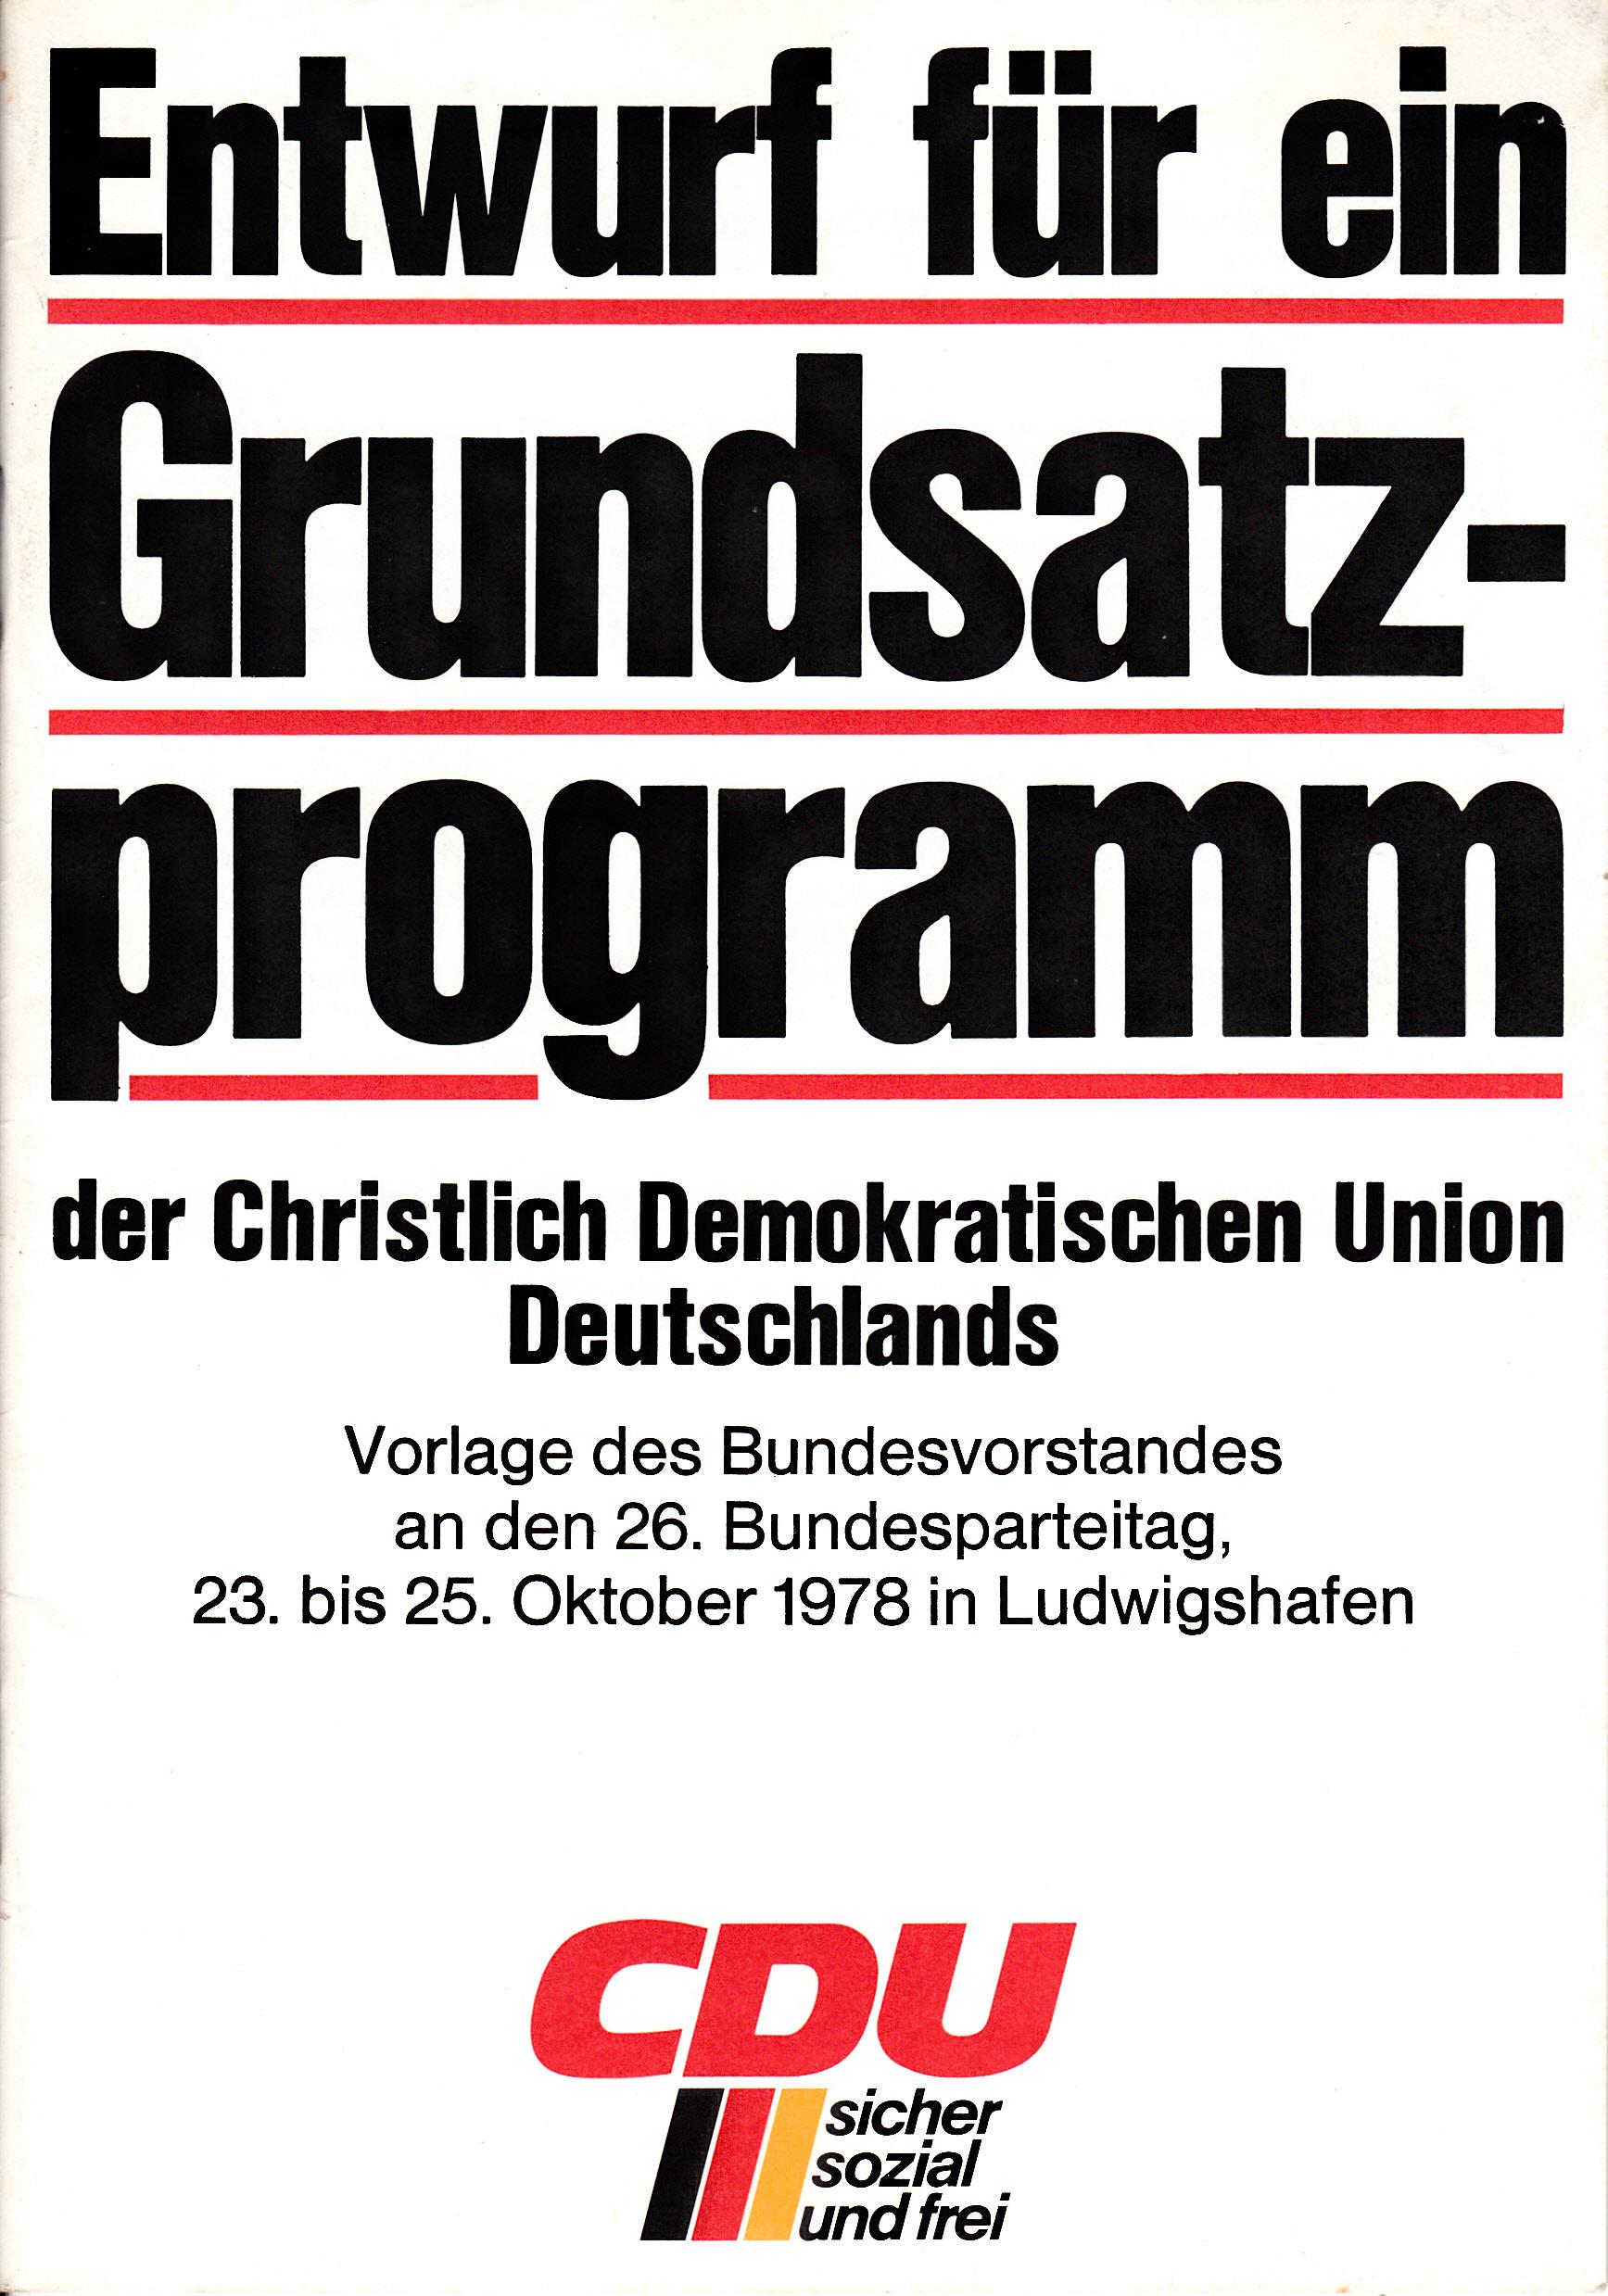 CDU_alemanha_0004